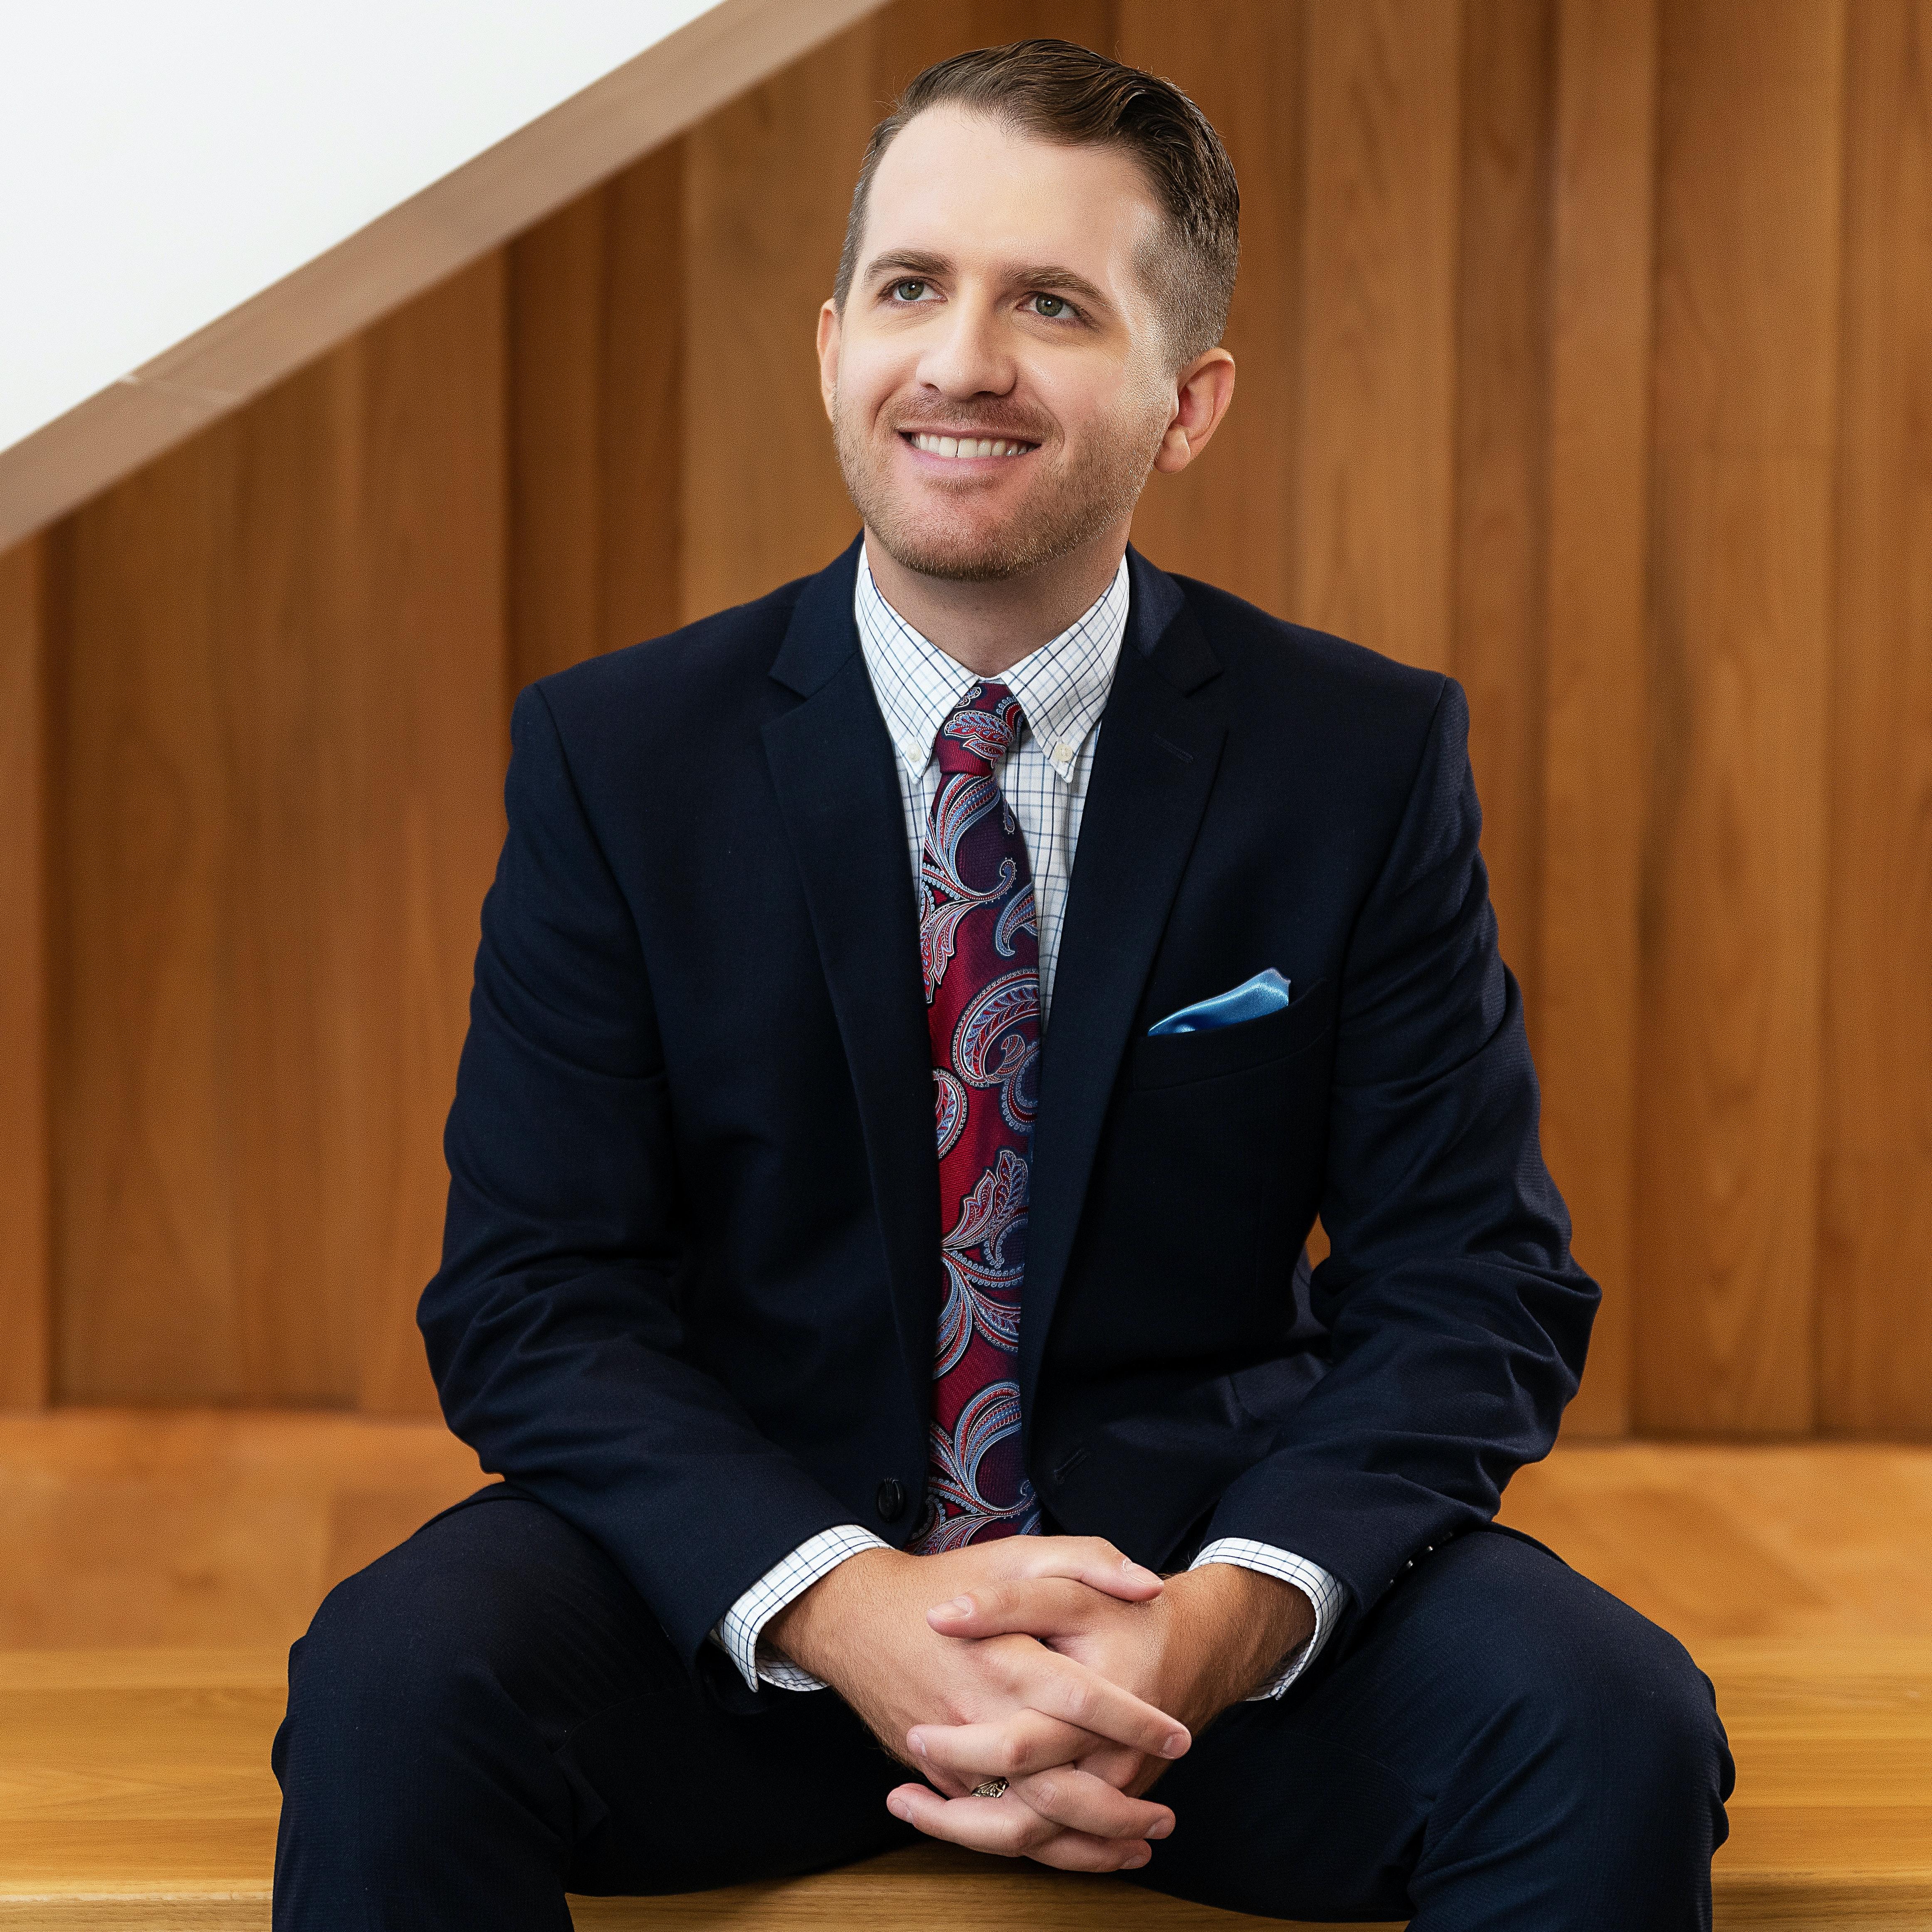 Dr. Matthew Richardson Reveals How He Got Hooked on Plastic Surgery